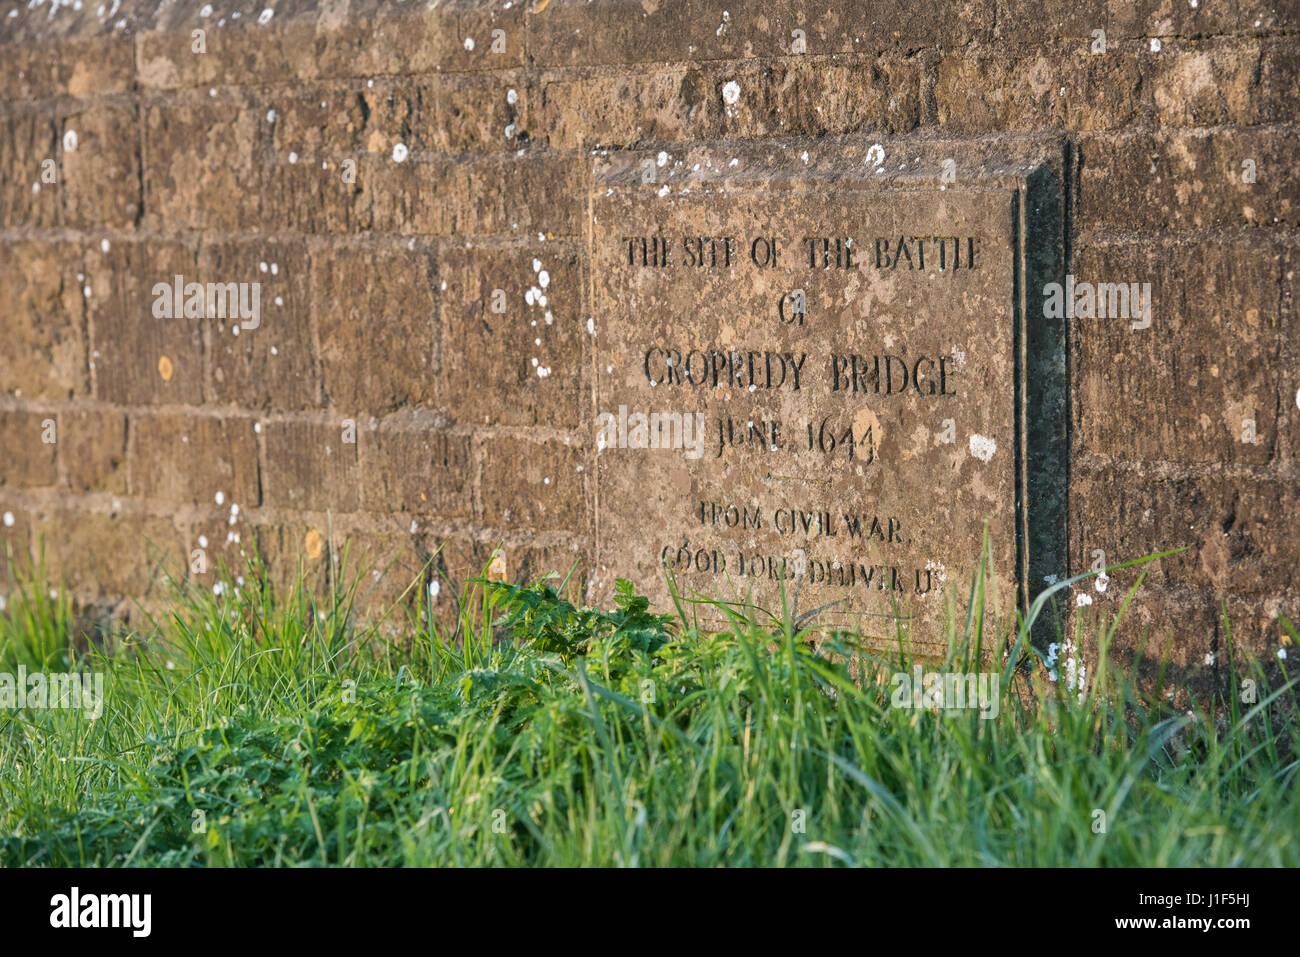 Battle of Cropredy Bridge stone plaque on the bridge in morning sunlight. Cropredy, Oxfordshire, England - Stock Image